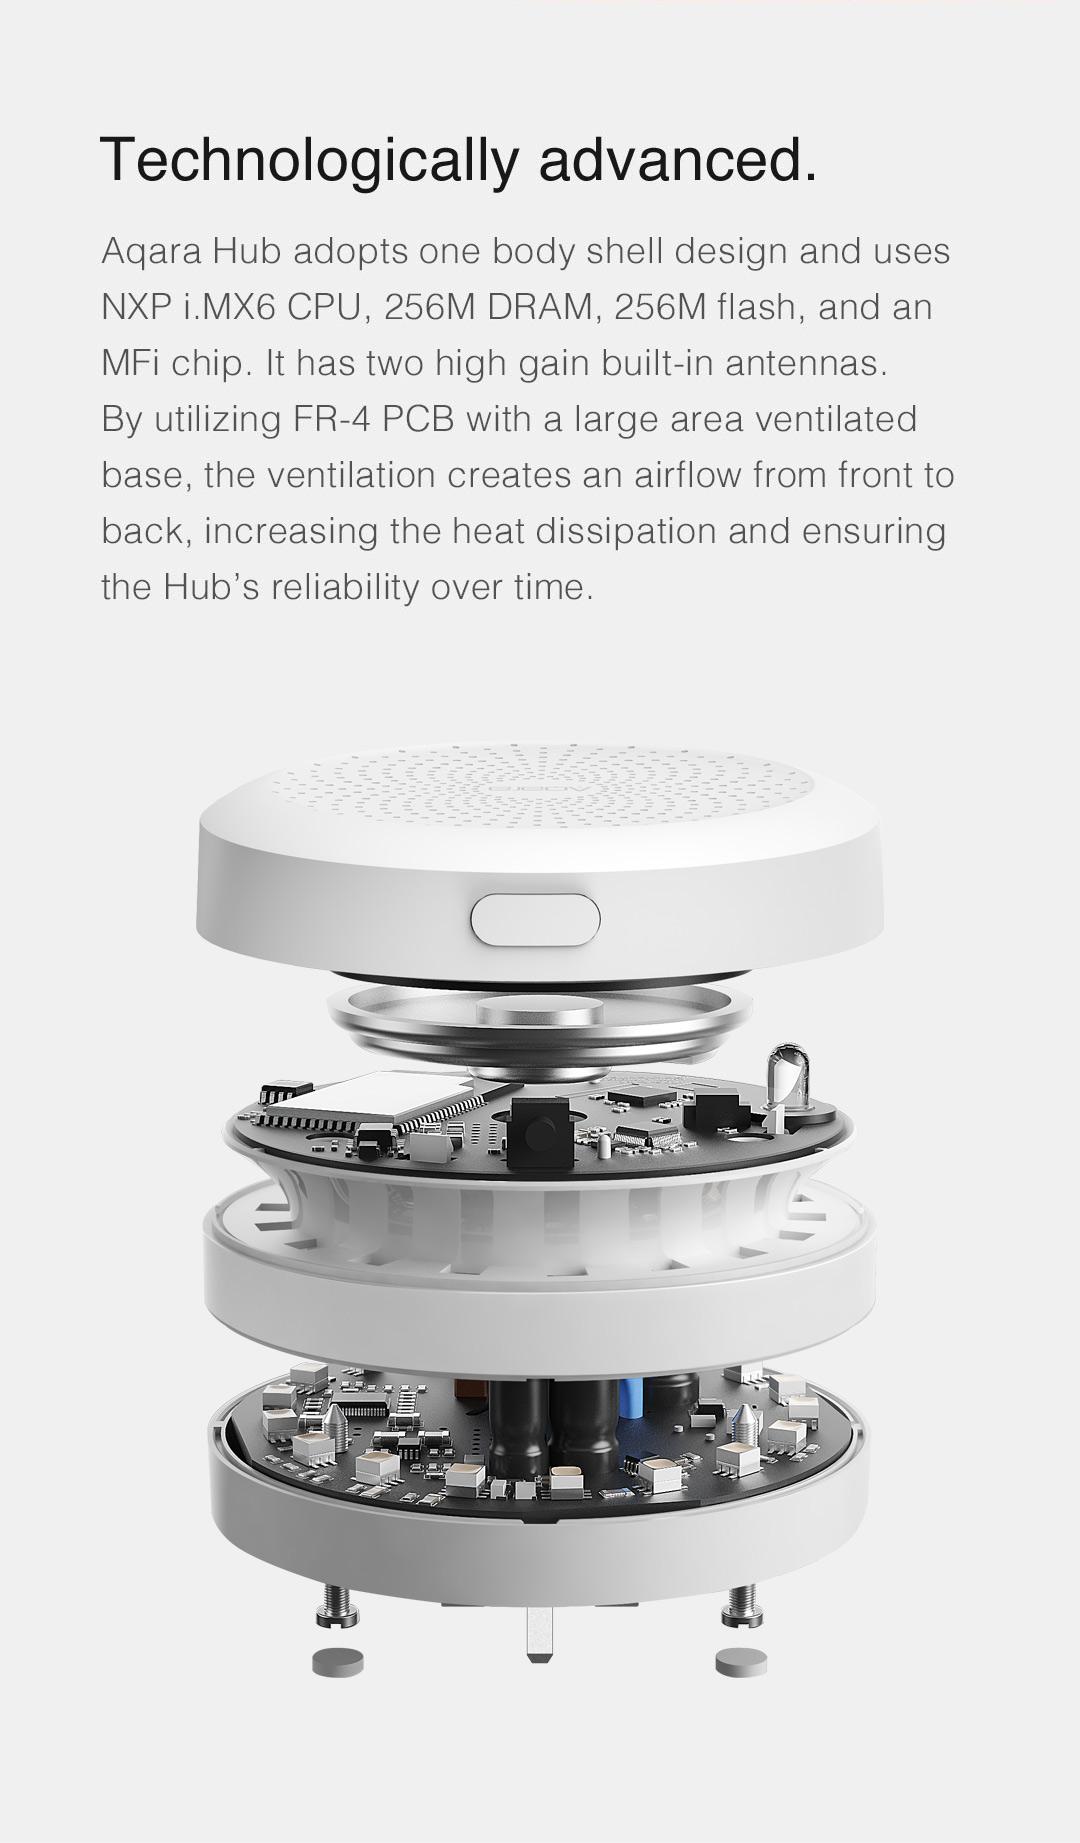 Aqara Hub adopts one body shell design and Advanced Technology